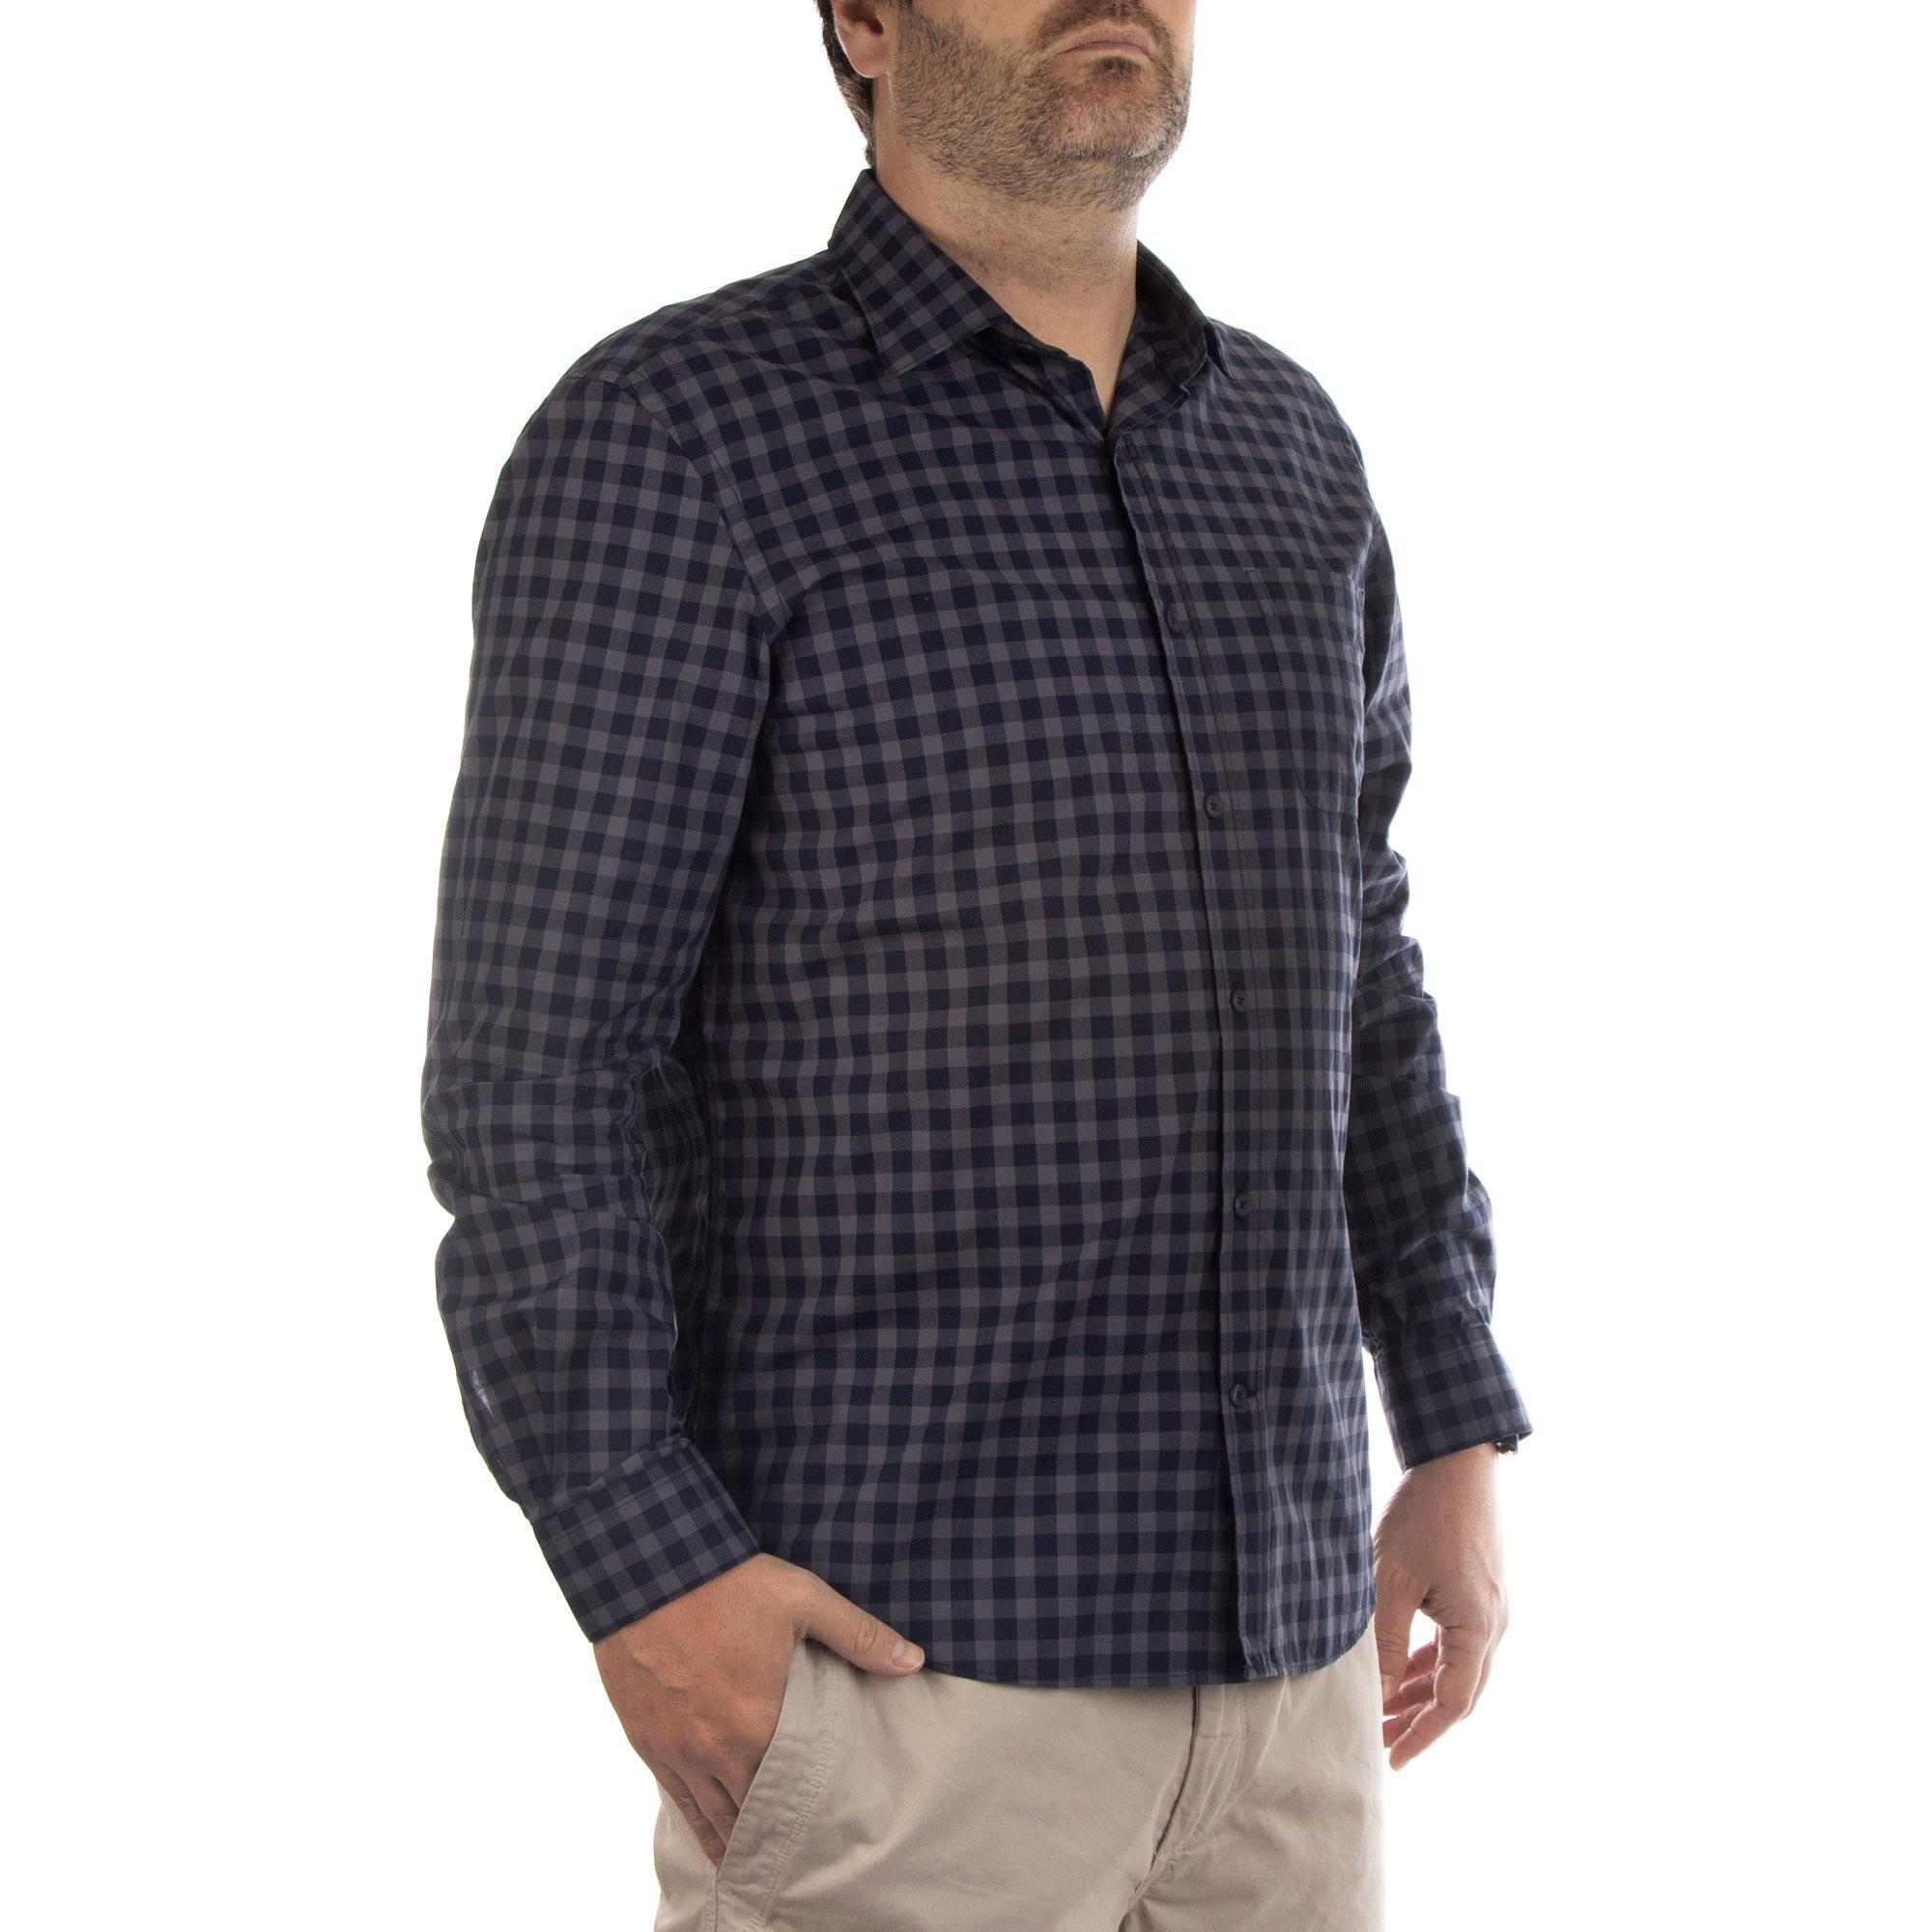 Richards Camisa Texas Xadrez Manga Longa Masculino Quadriculado